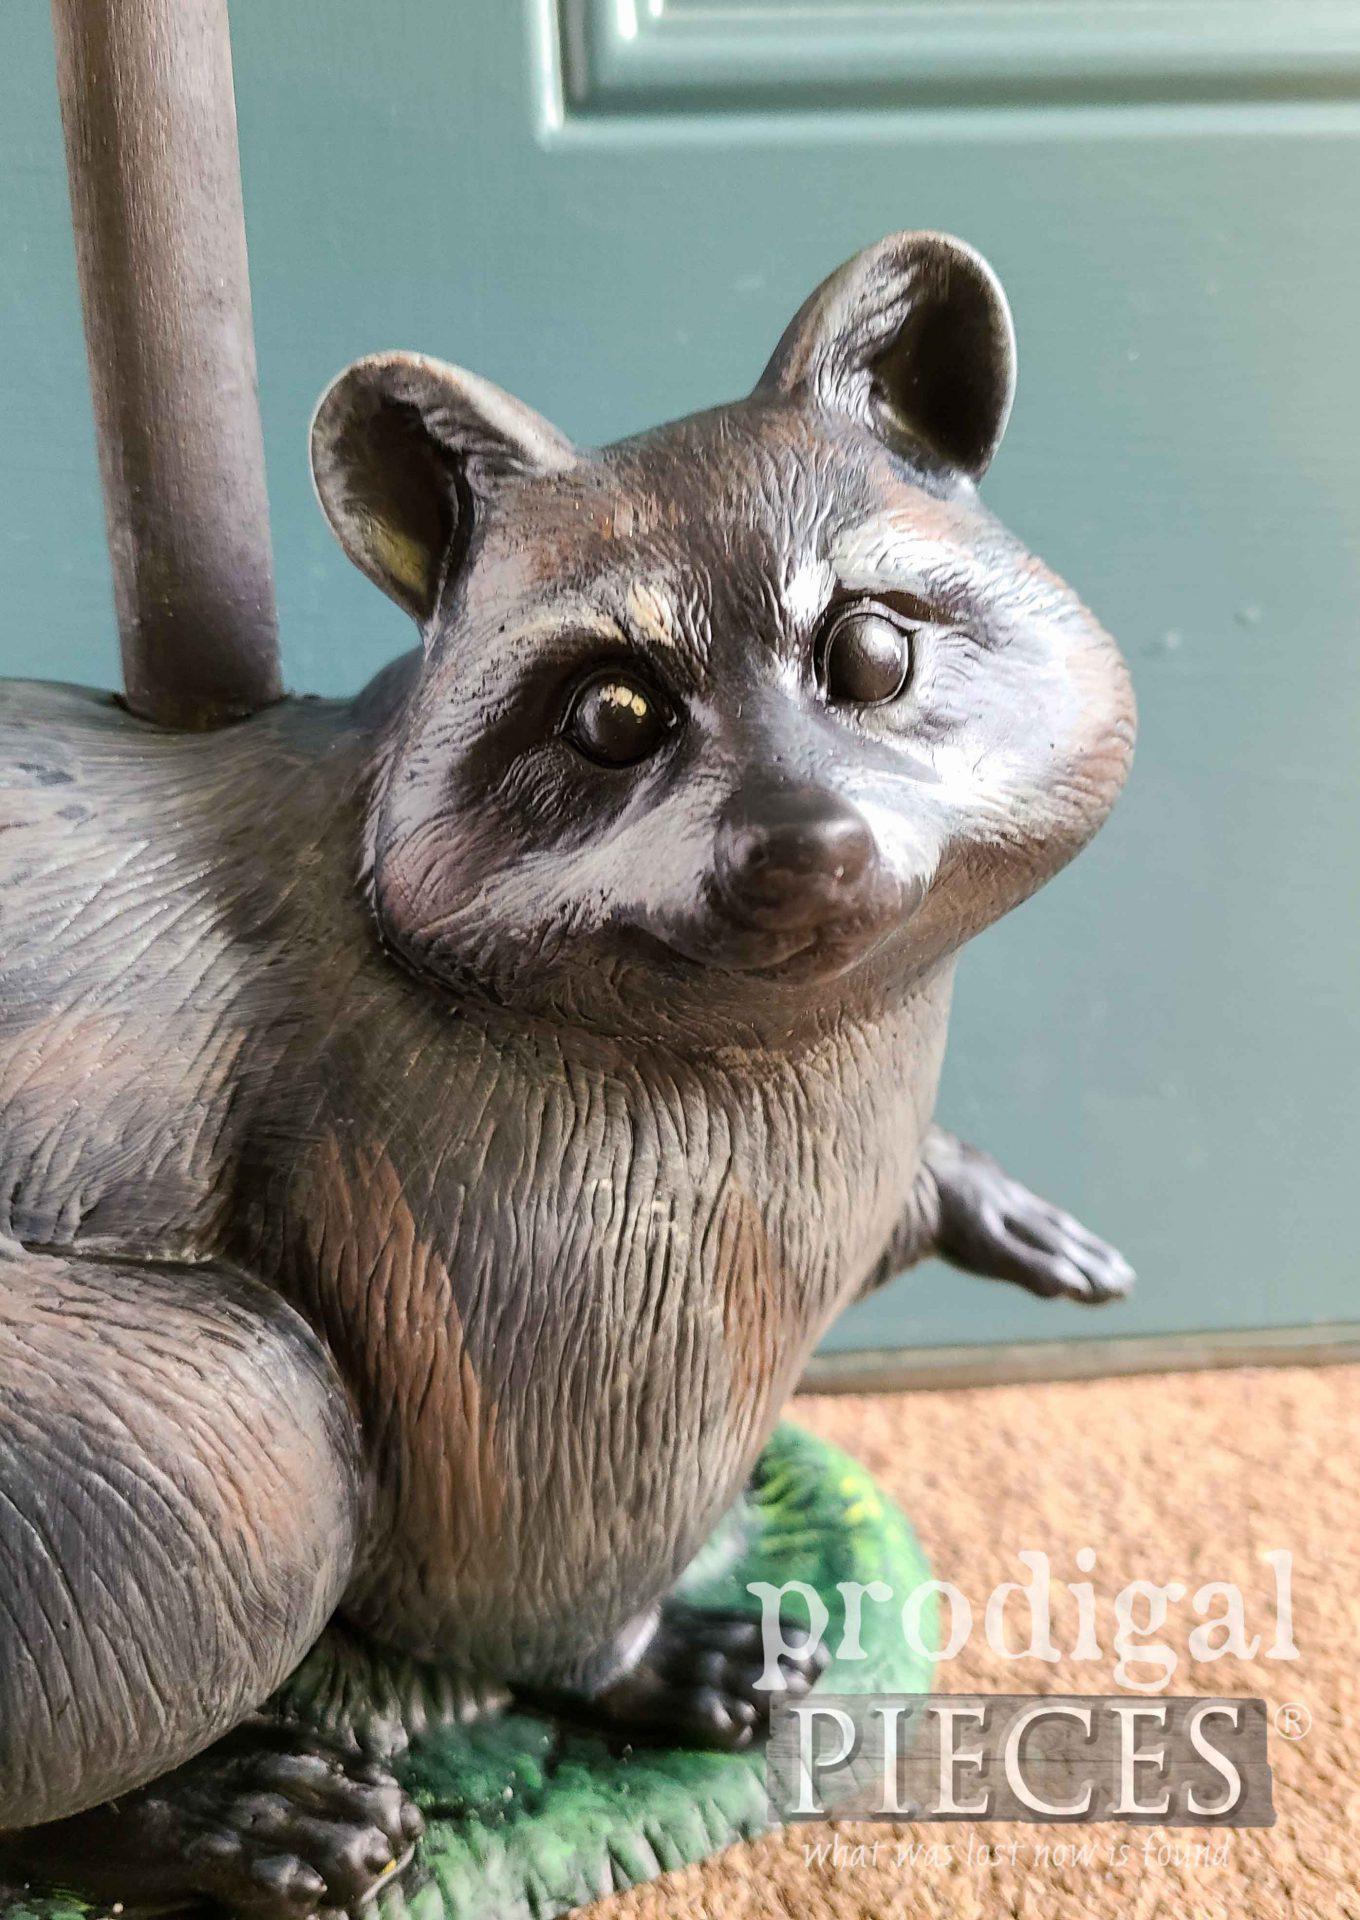 Smiling Raccoon DIY Doorstop by Larissa of Prodigal Pieces | prodigalpieces.com #prodigalpieces #diy #home #farmhouse #woodland